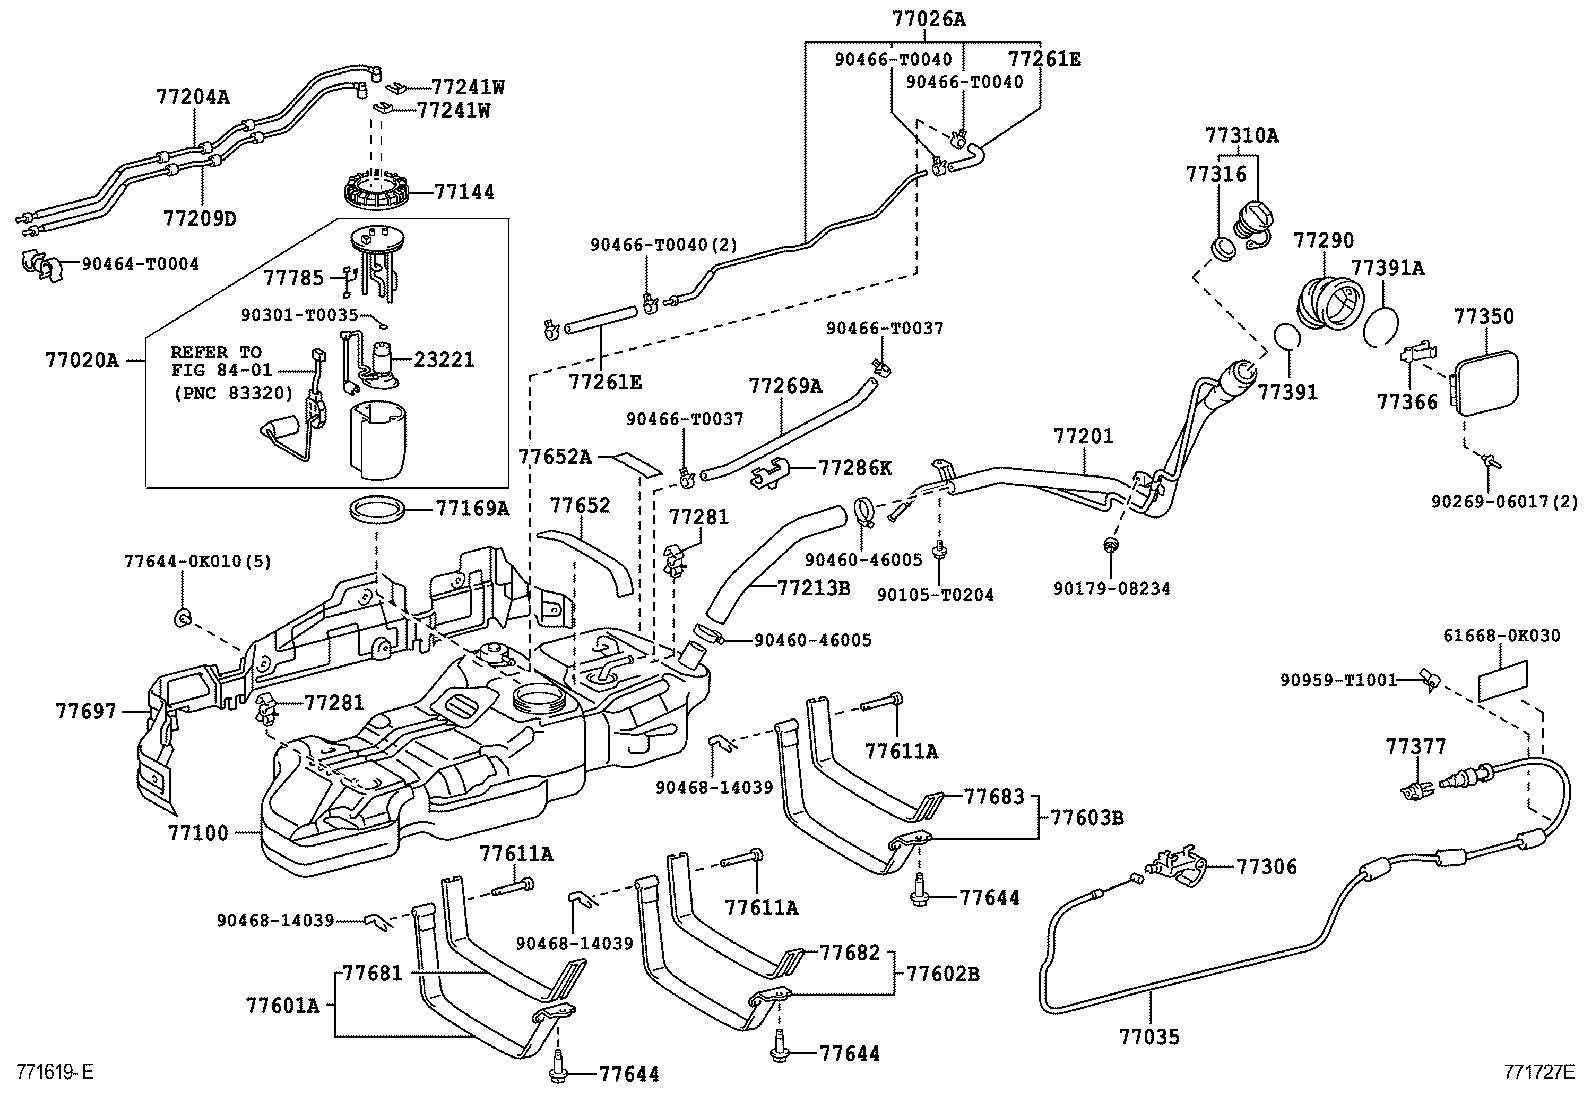 [DIAGRAM] Wiring Diagram Book Toyota Kijang Innova In pdf